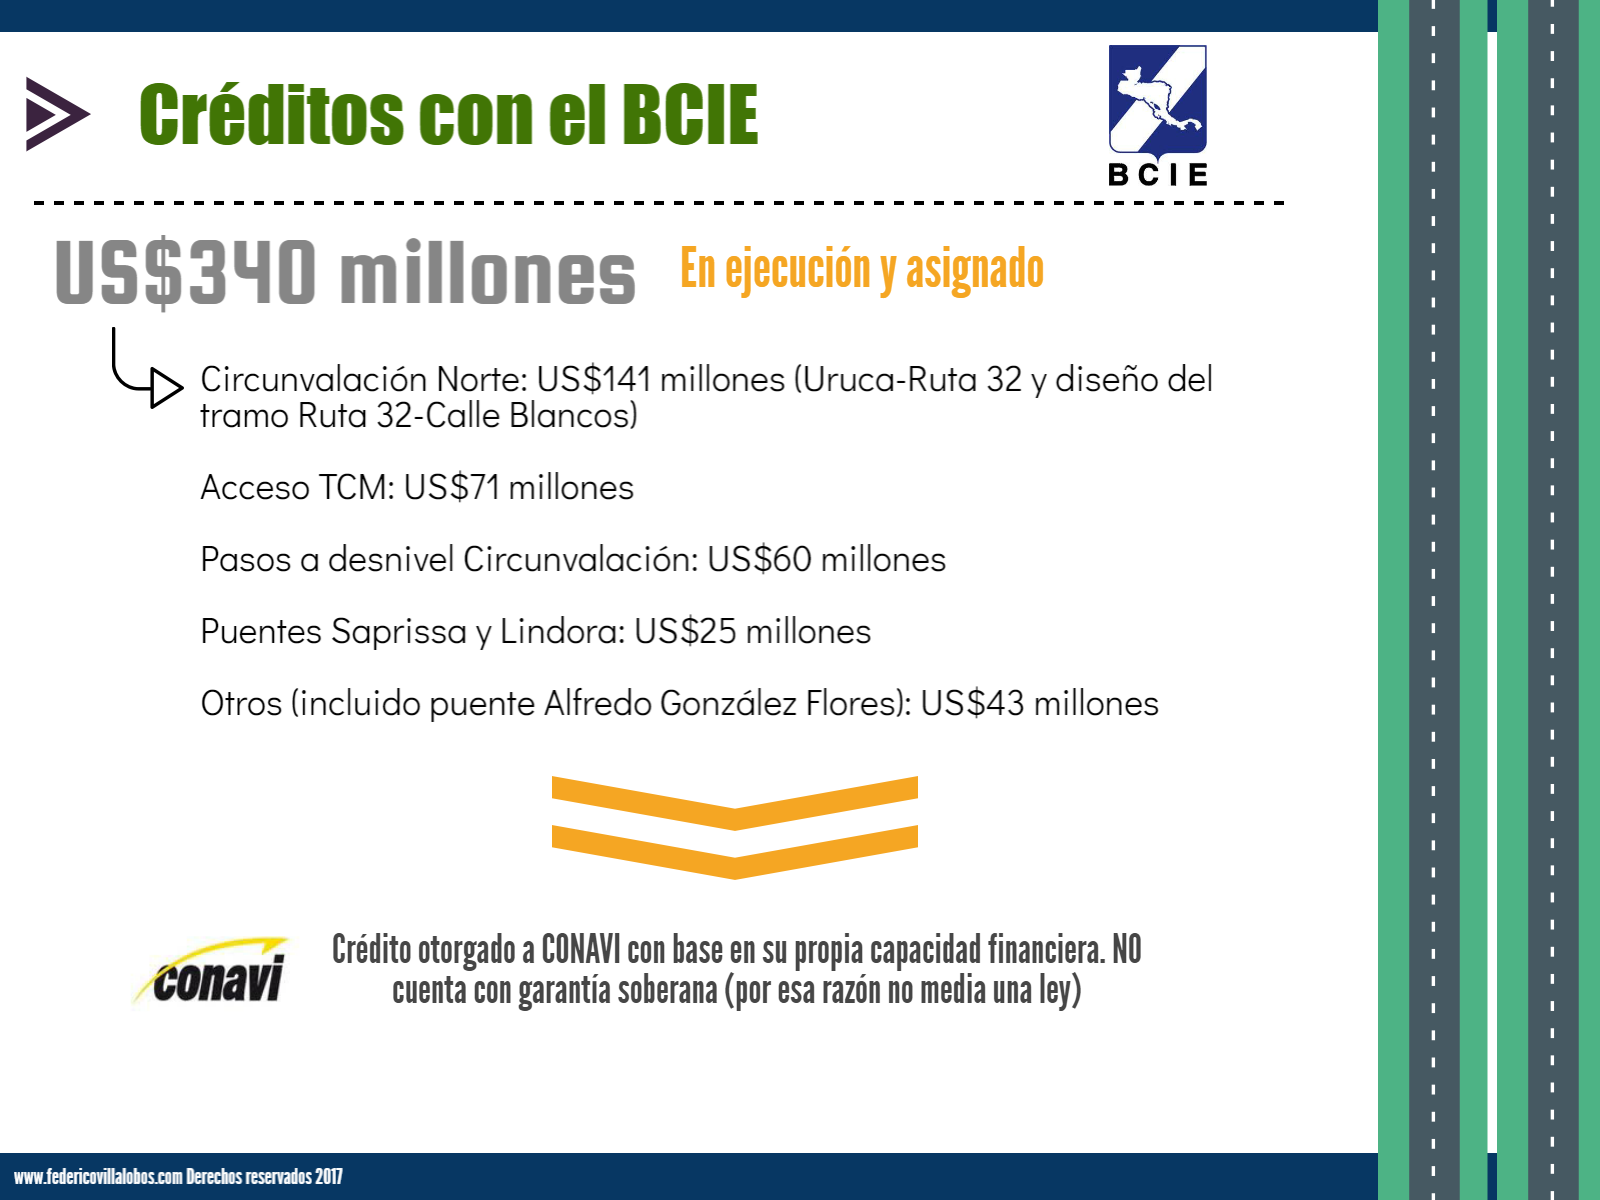 Créditos Internacionales Carreteras CR BCIE.png